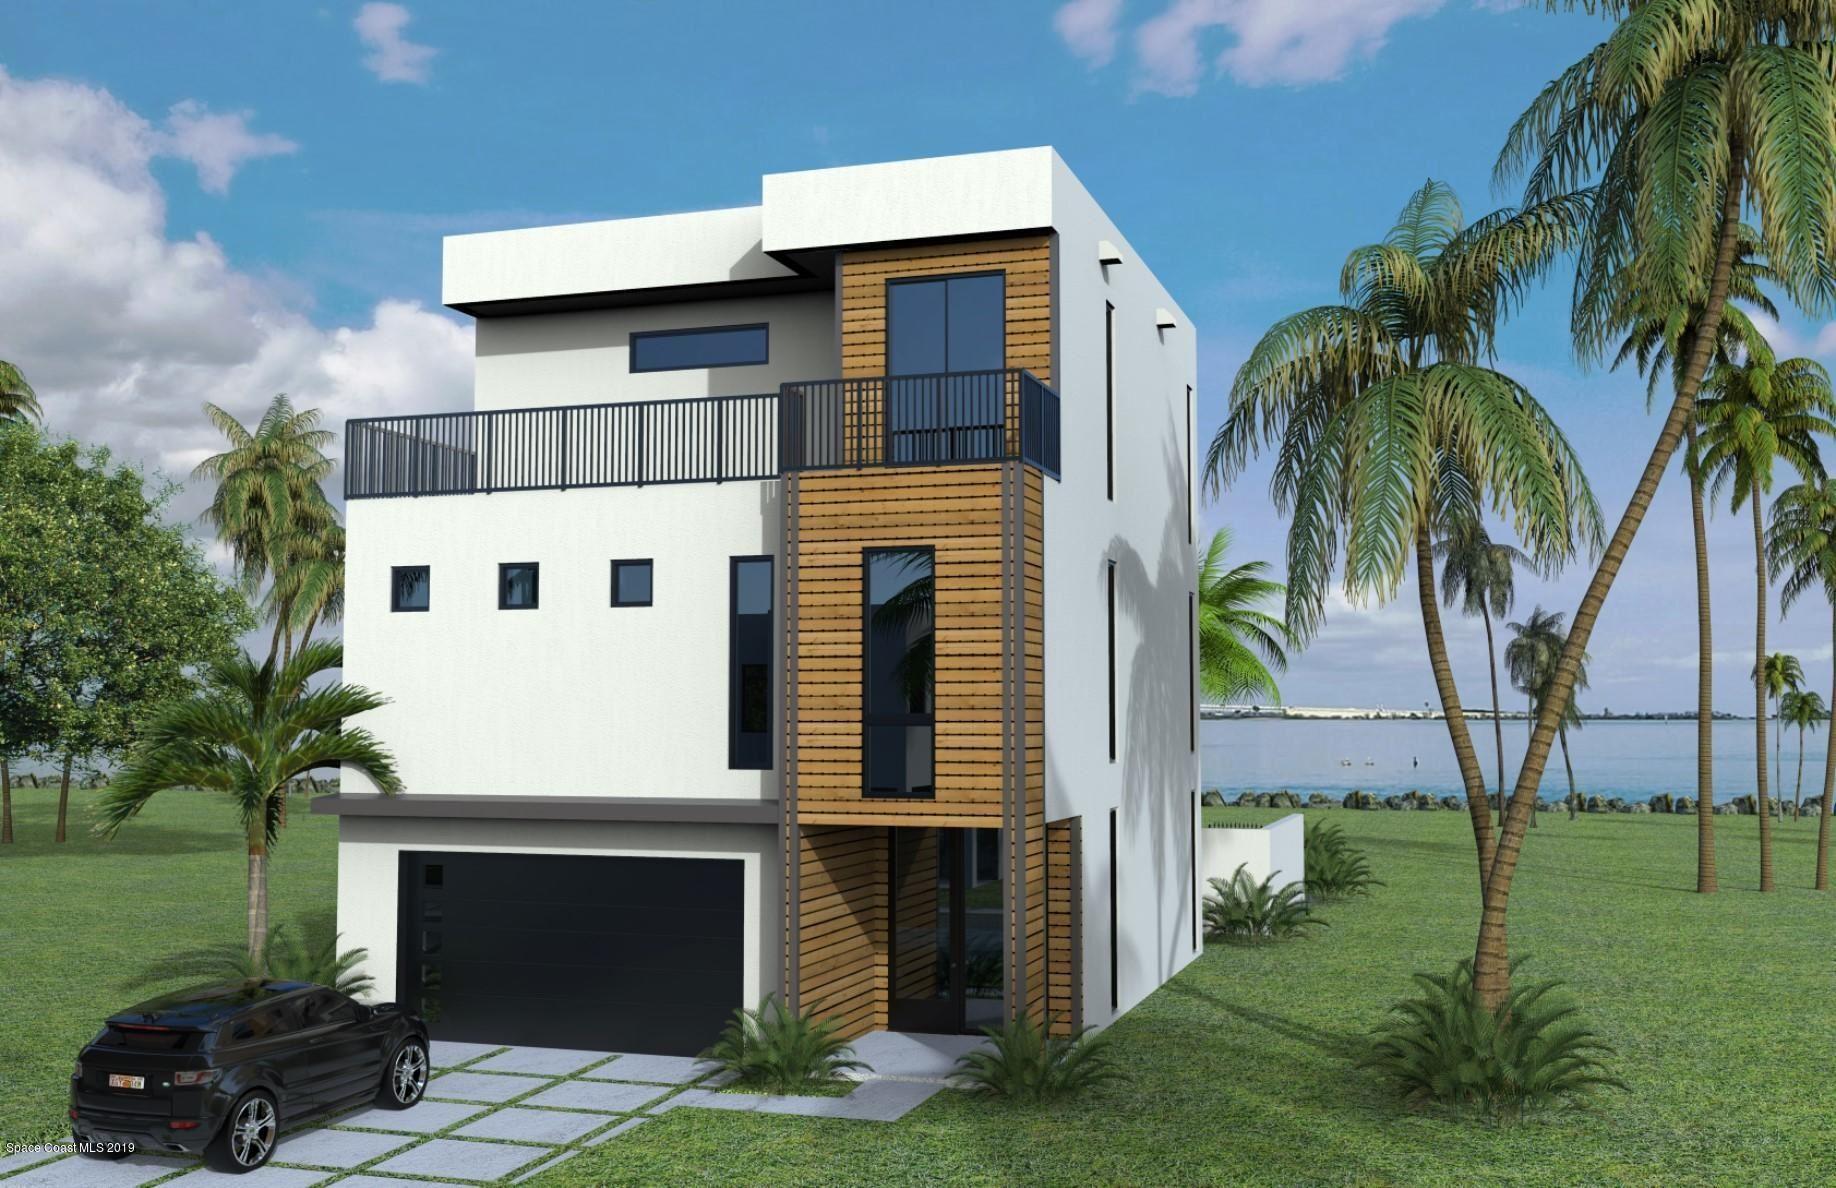 1356 S Banana River Drive                                                                               Merritt Island                                                                      , FL - $1,695,000